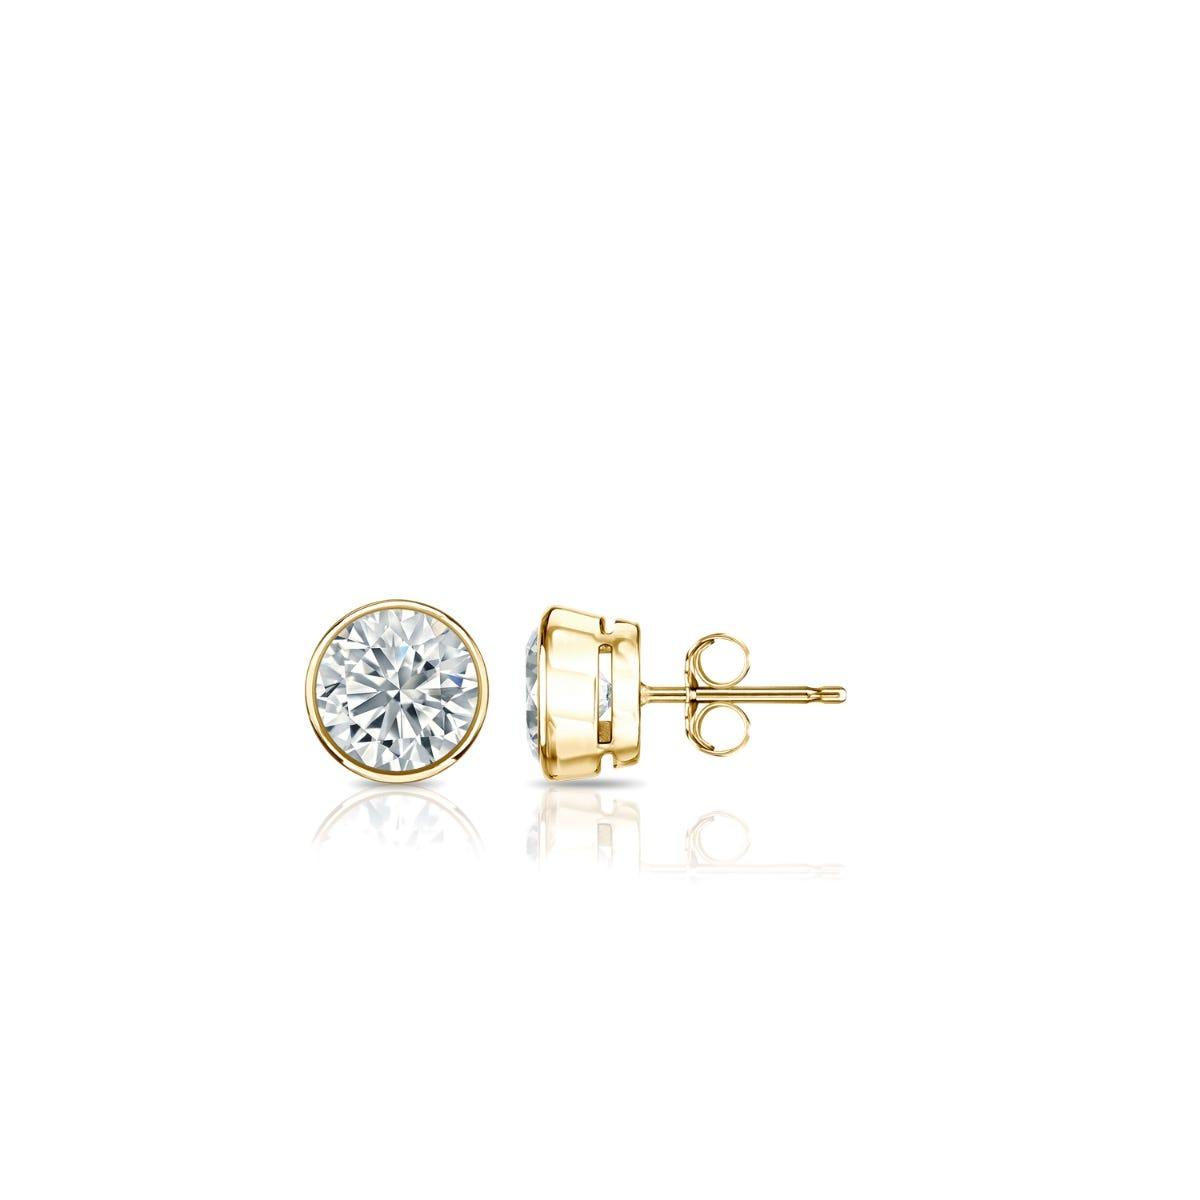 Diamond Round Bezel-Set 1/10ctw. Solitaire Stud (IJ-VS2) Earrings in 14K Yellow Gold